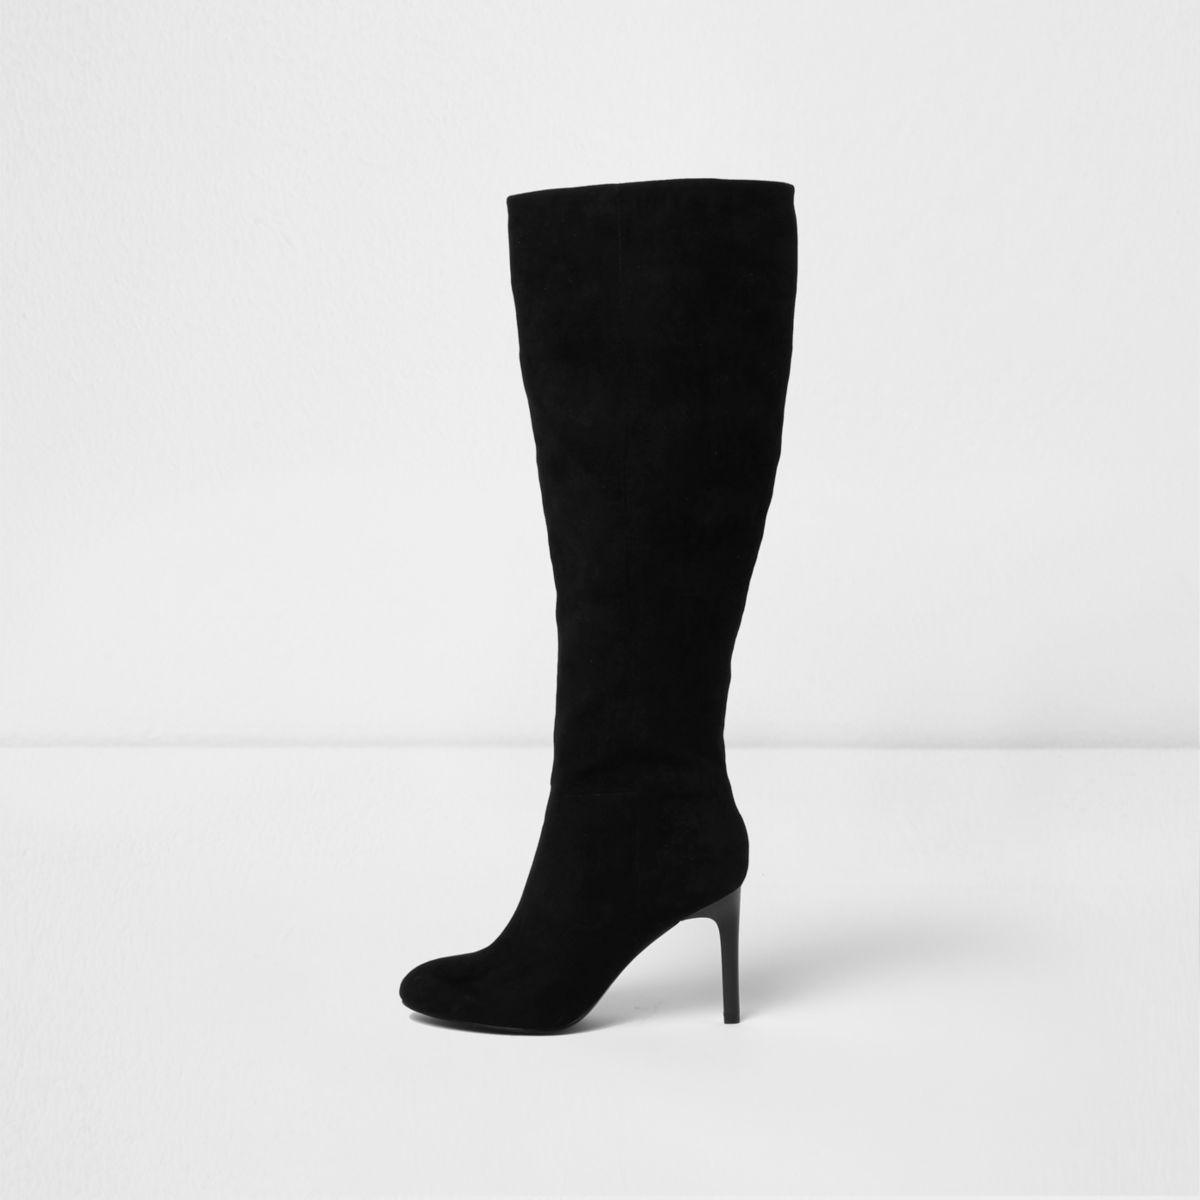 Black stiletto heel knee high boots